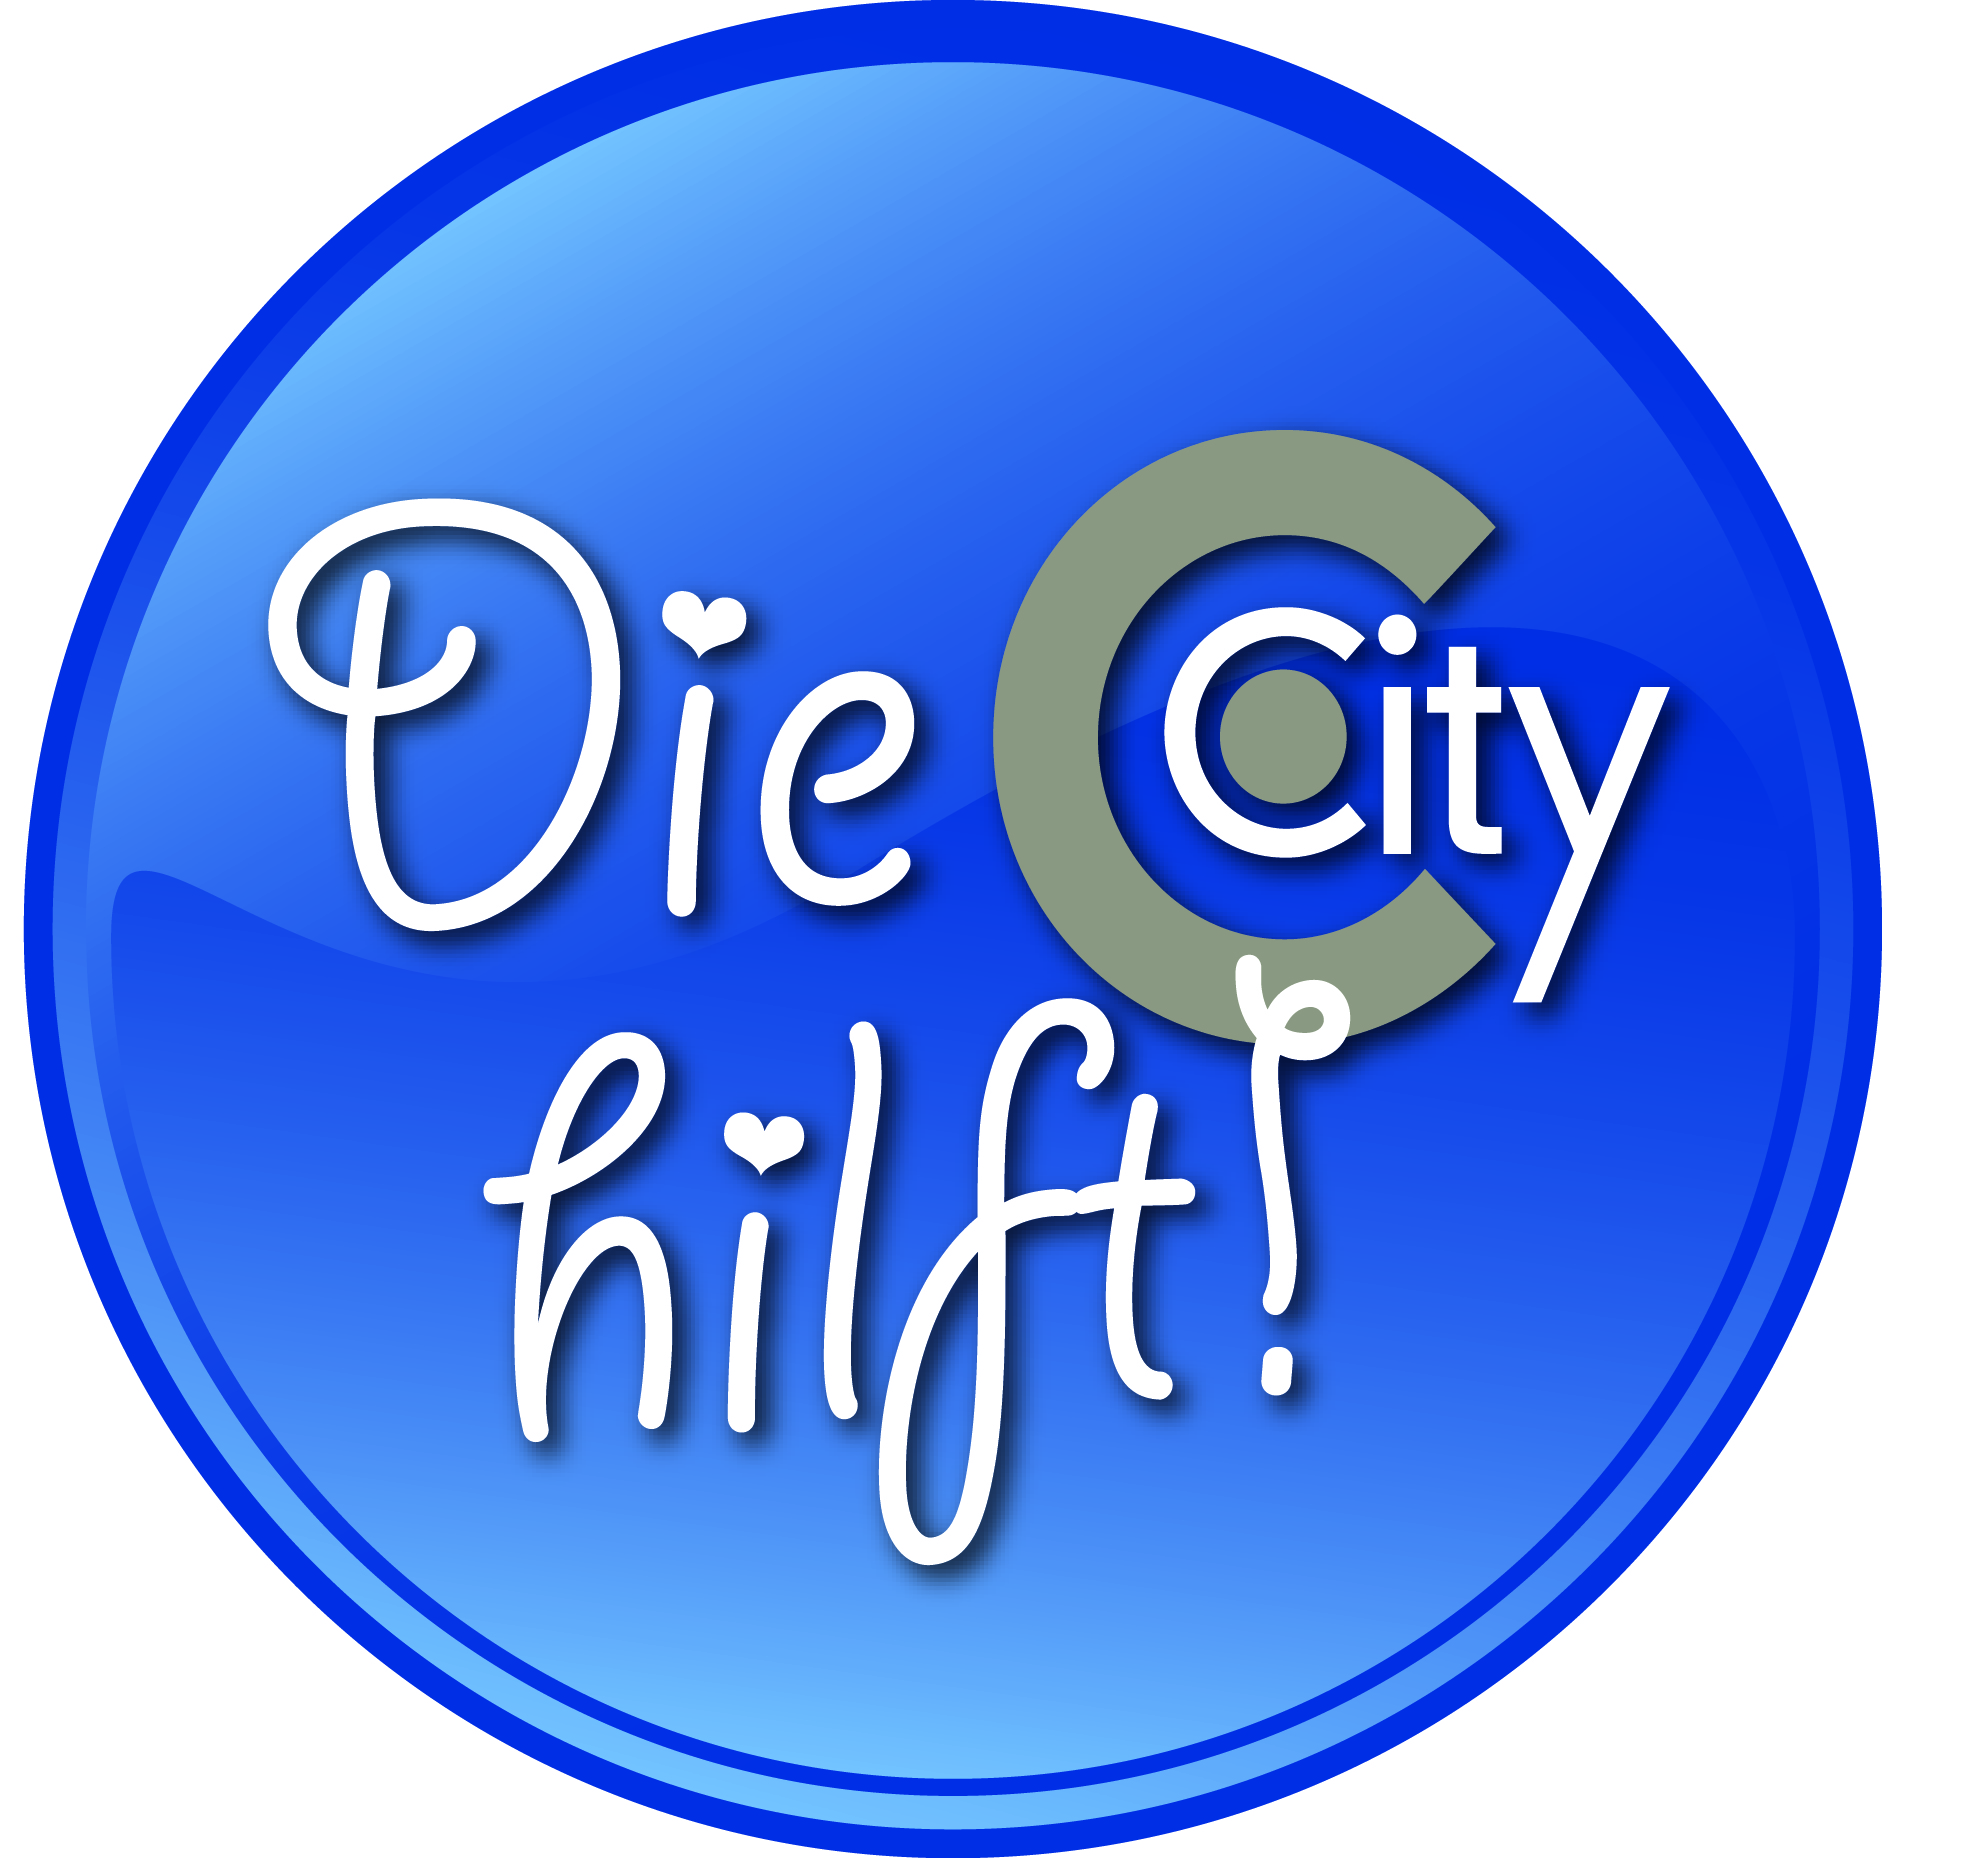 Die City hilft